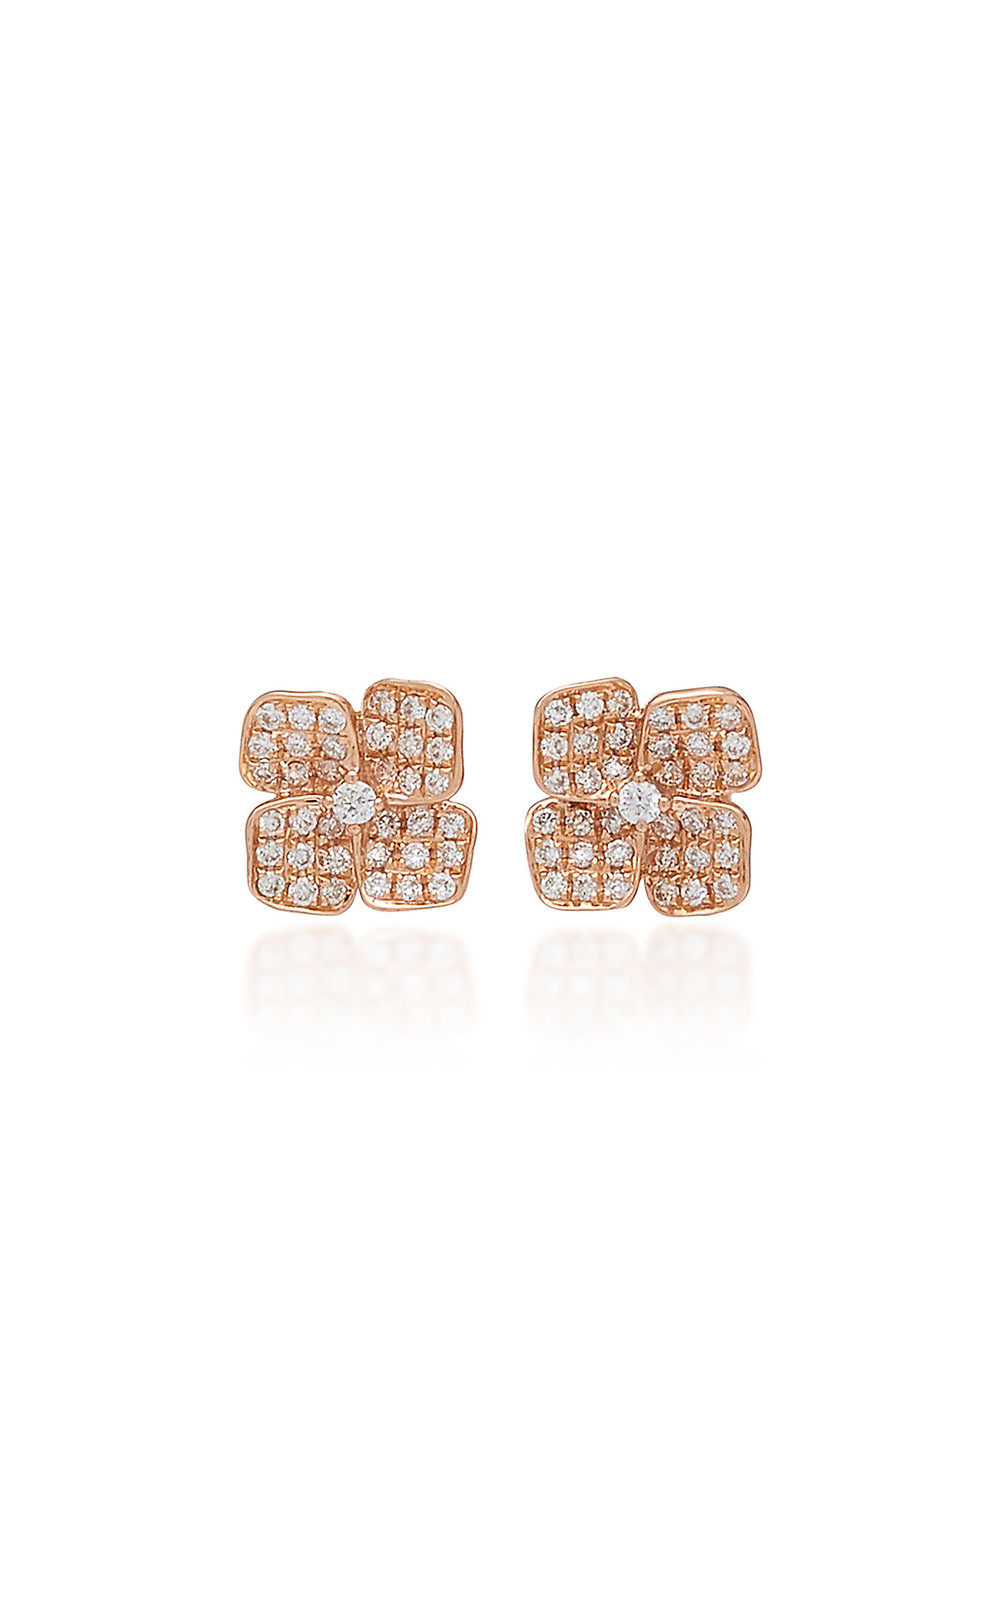 Anita Ko Floral 18K Gold And Diamond Stud Earrings in pink